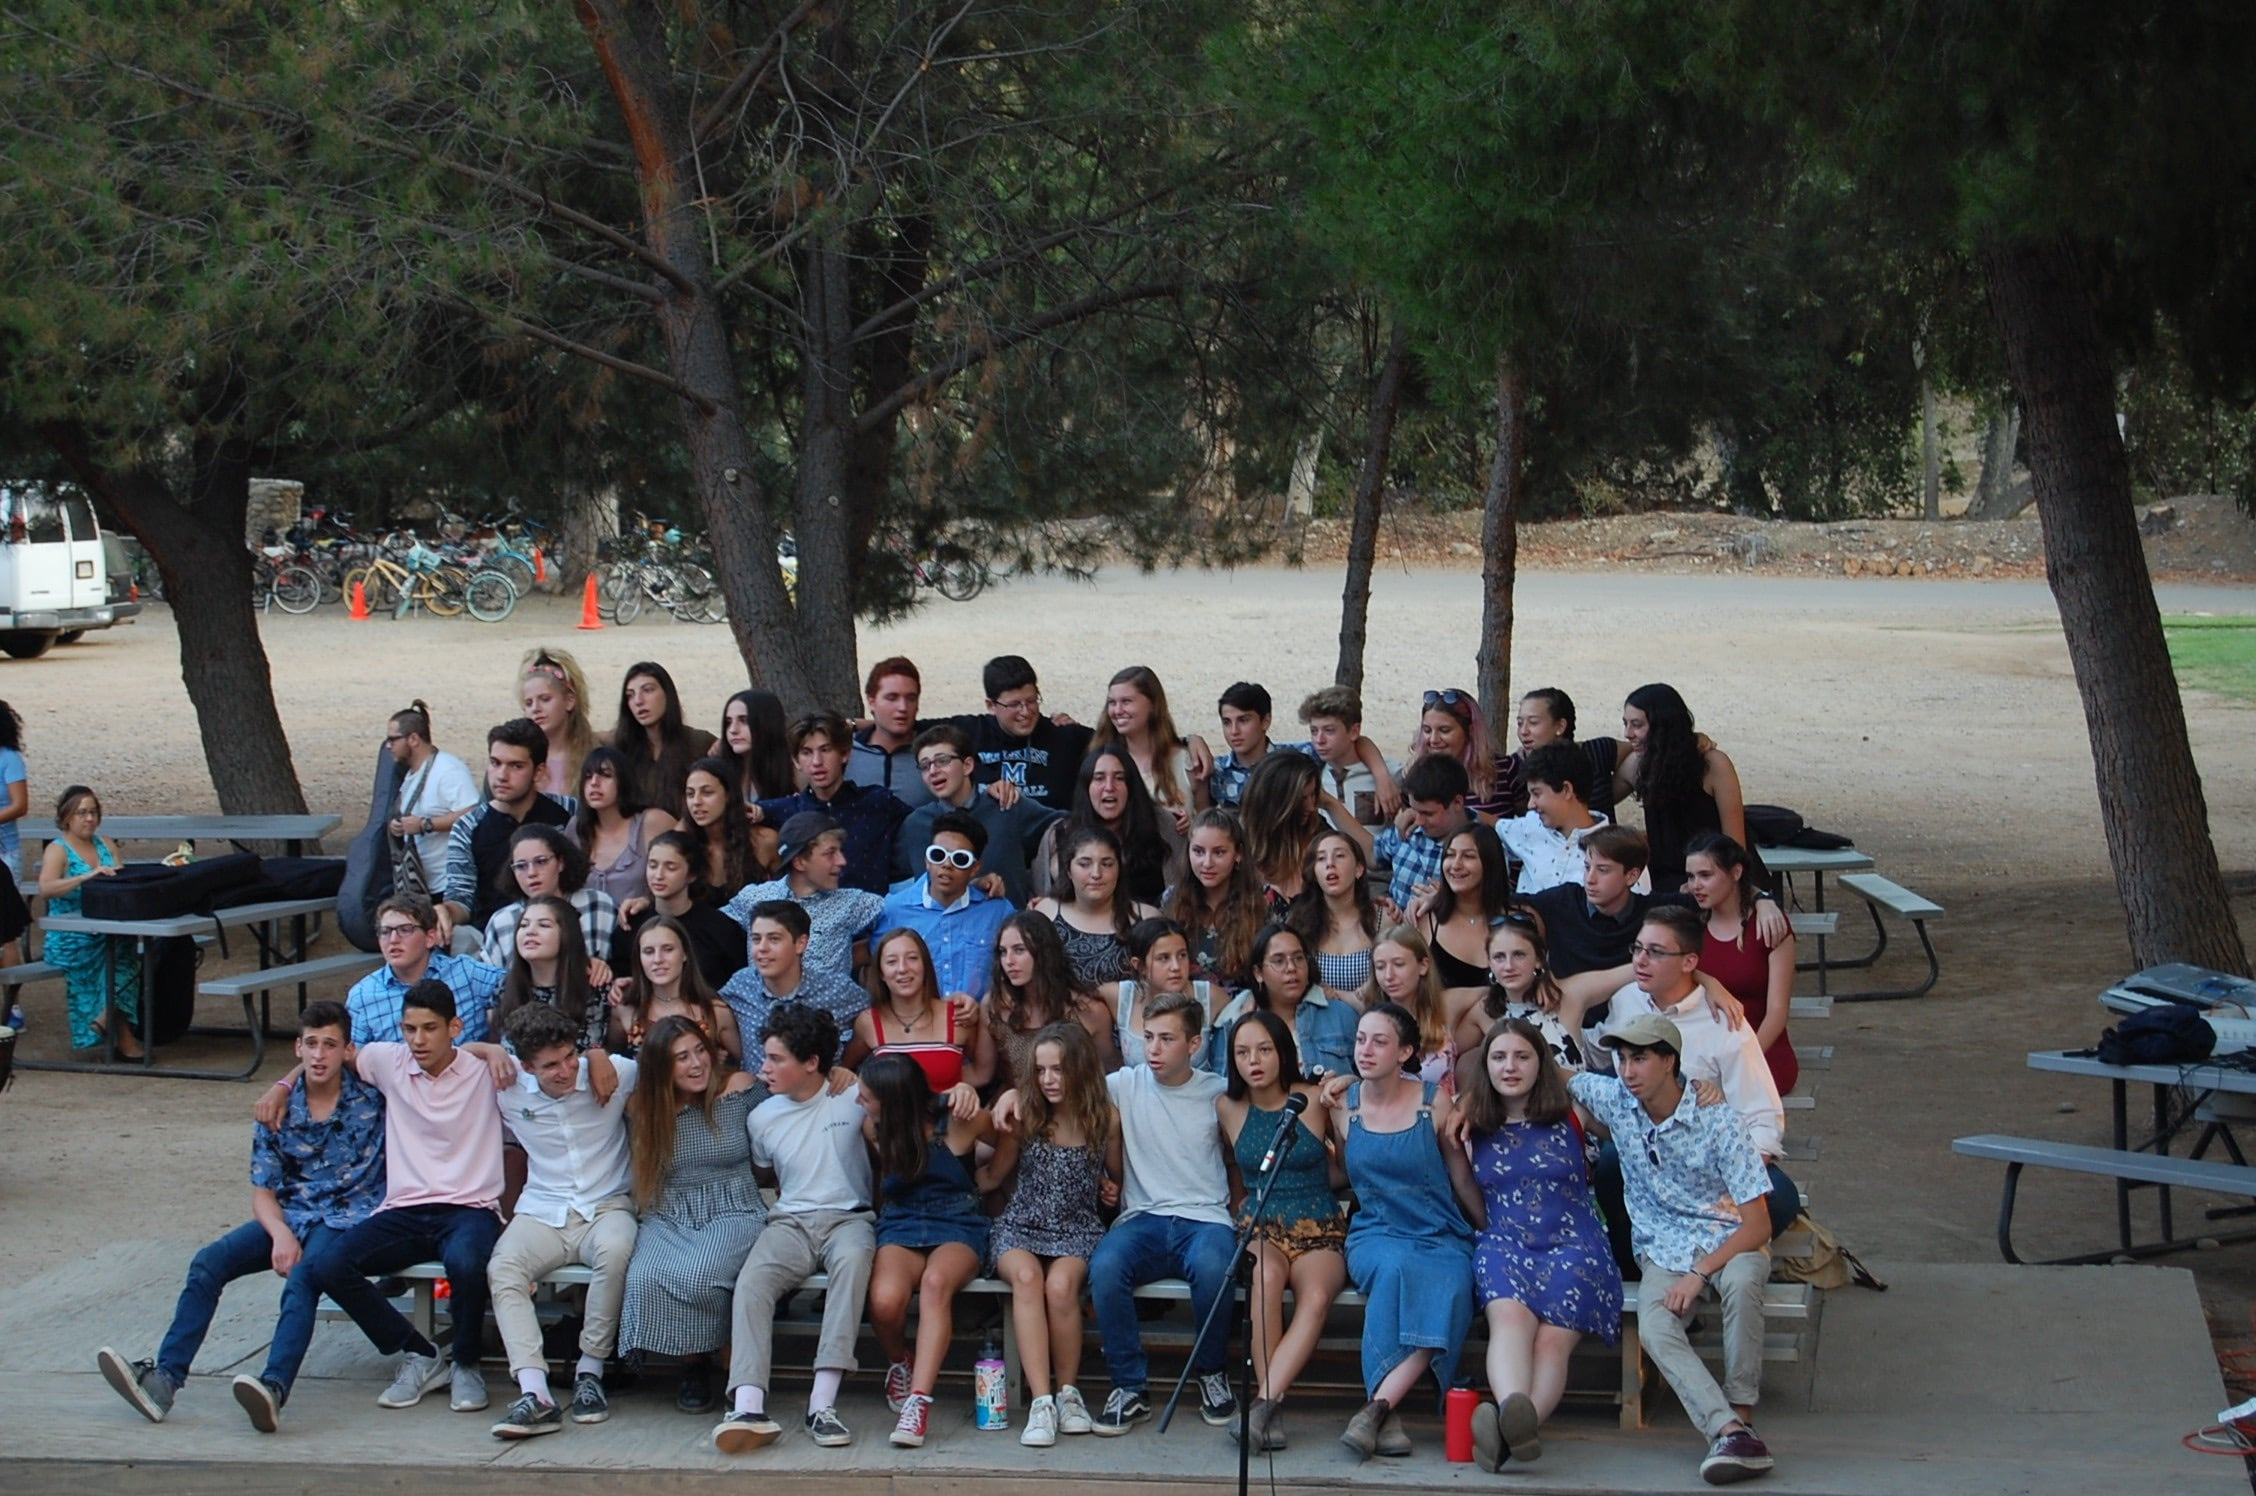 Yachad (Together) Summer Camp.